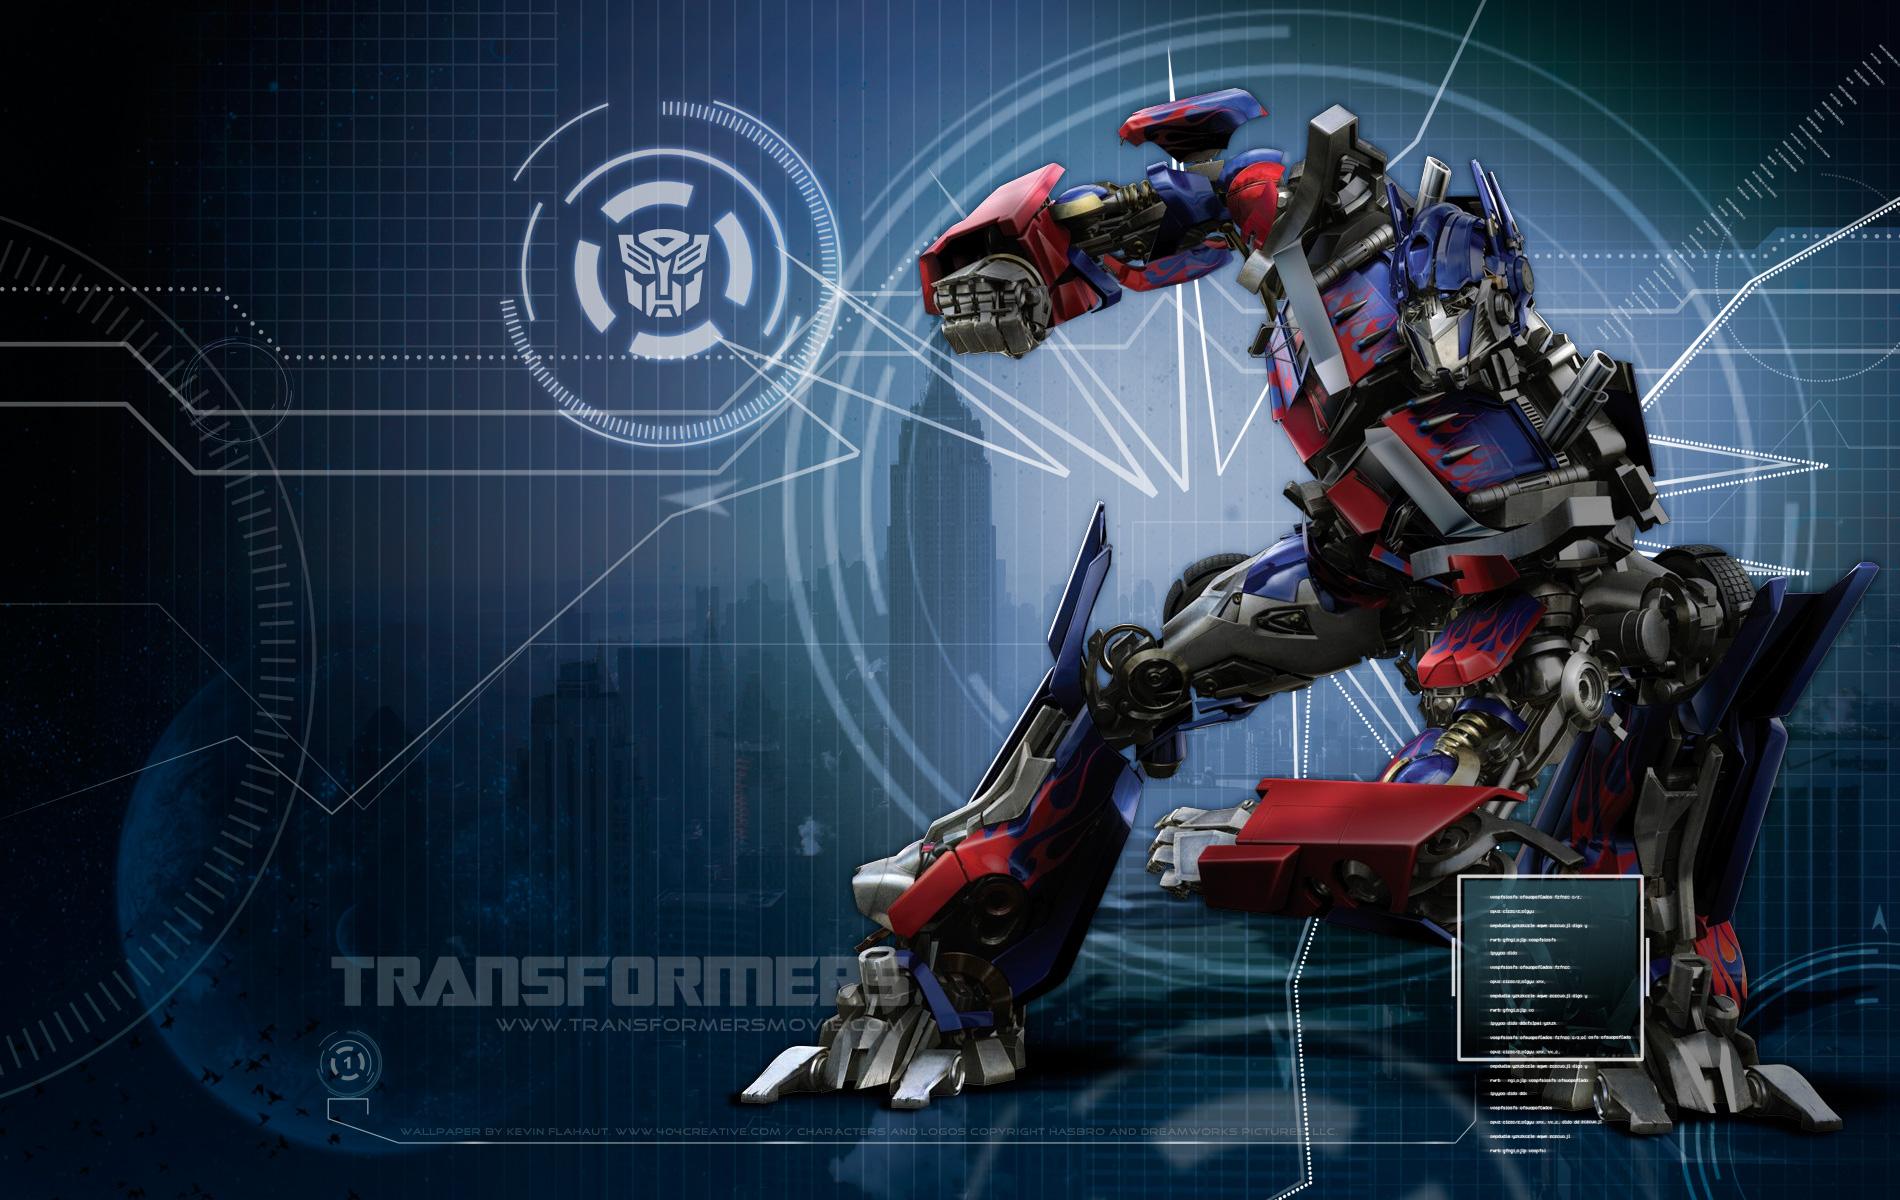 Transformers - Transformers Photo (78960) - Fanpop